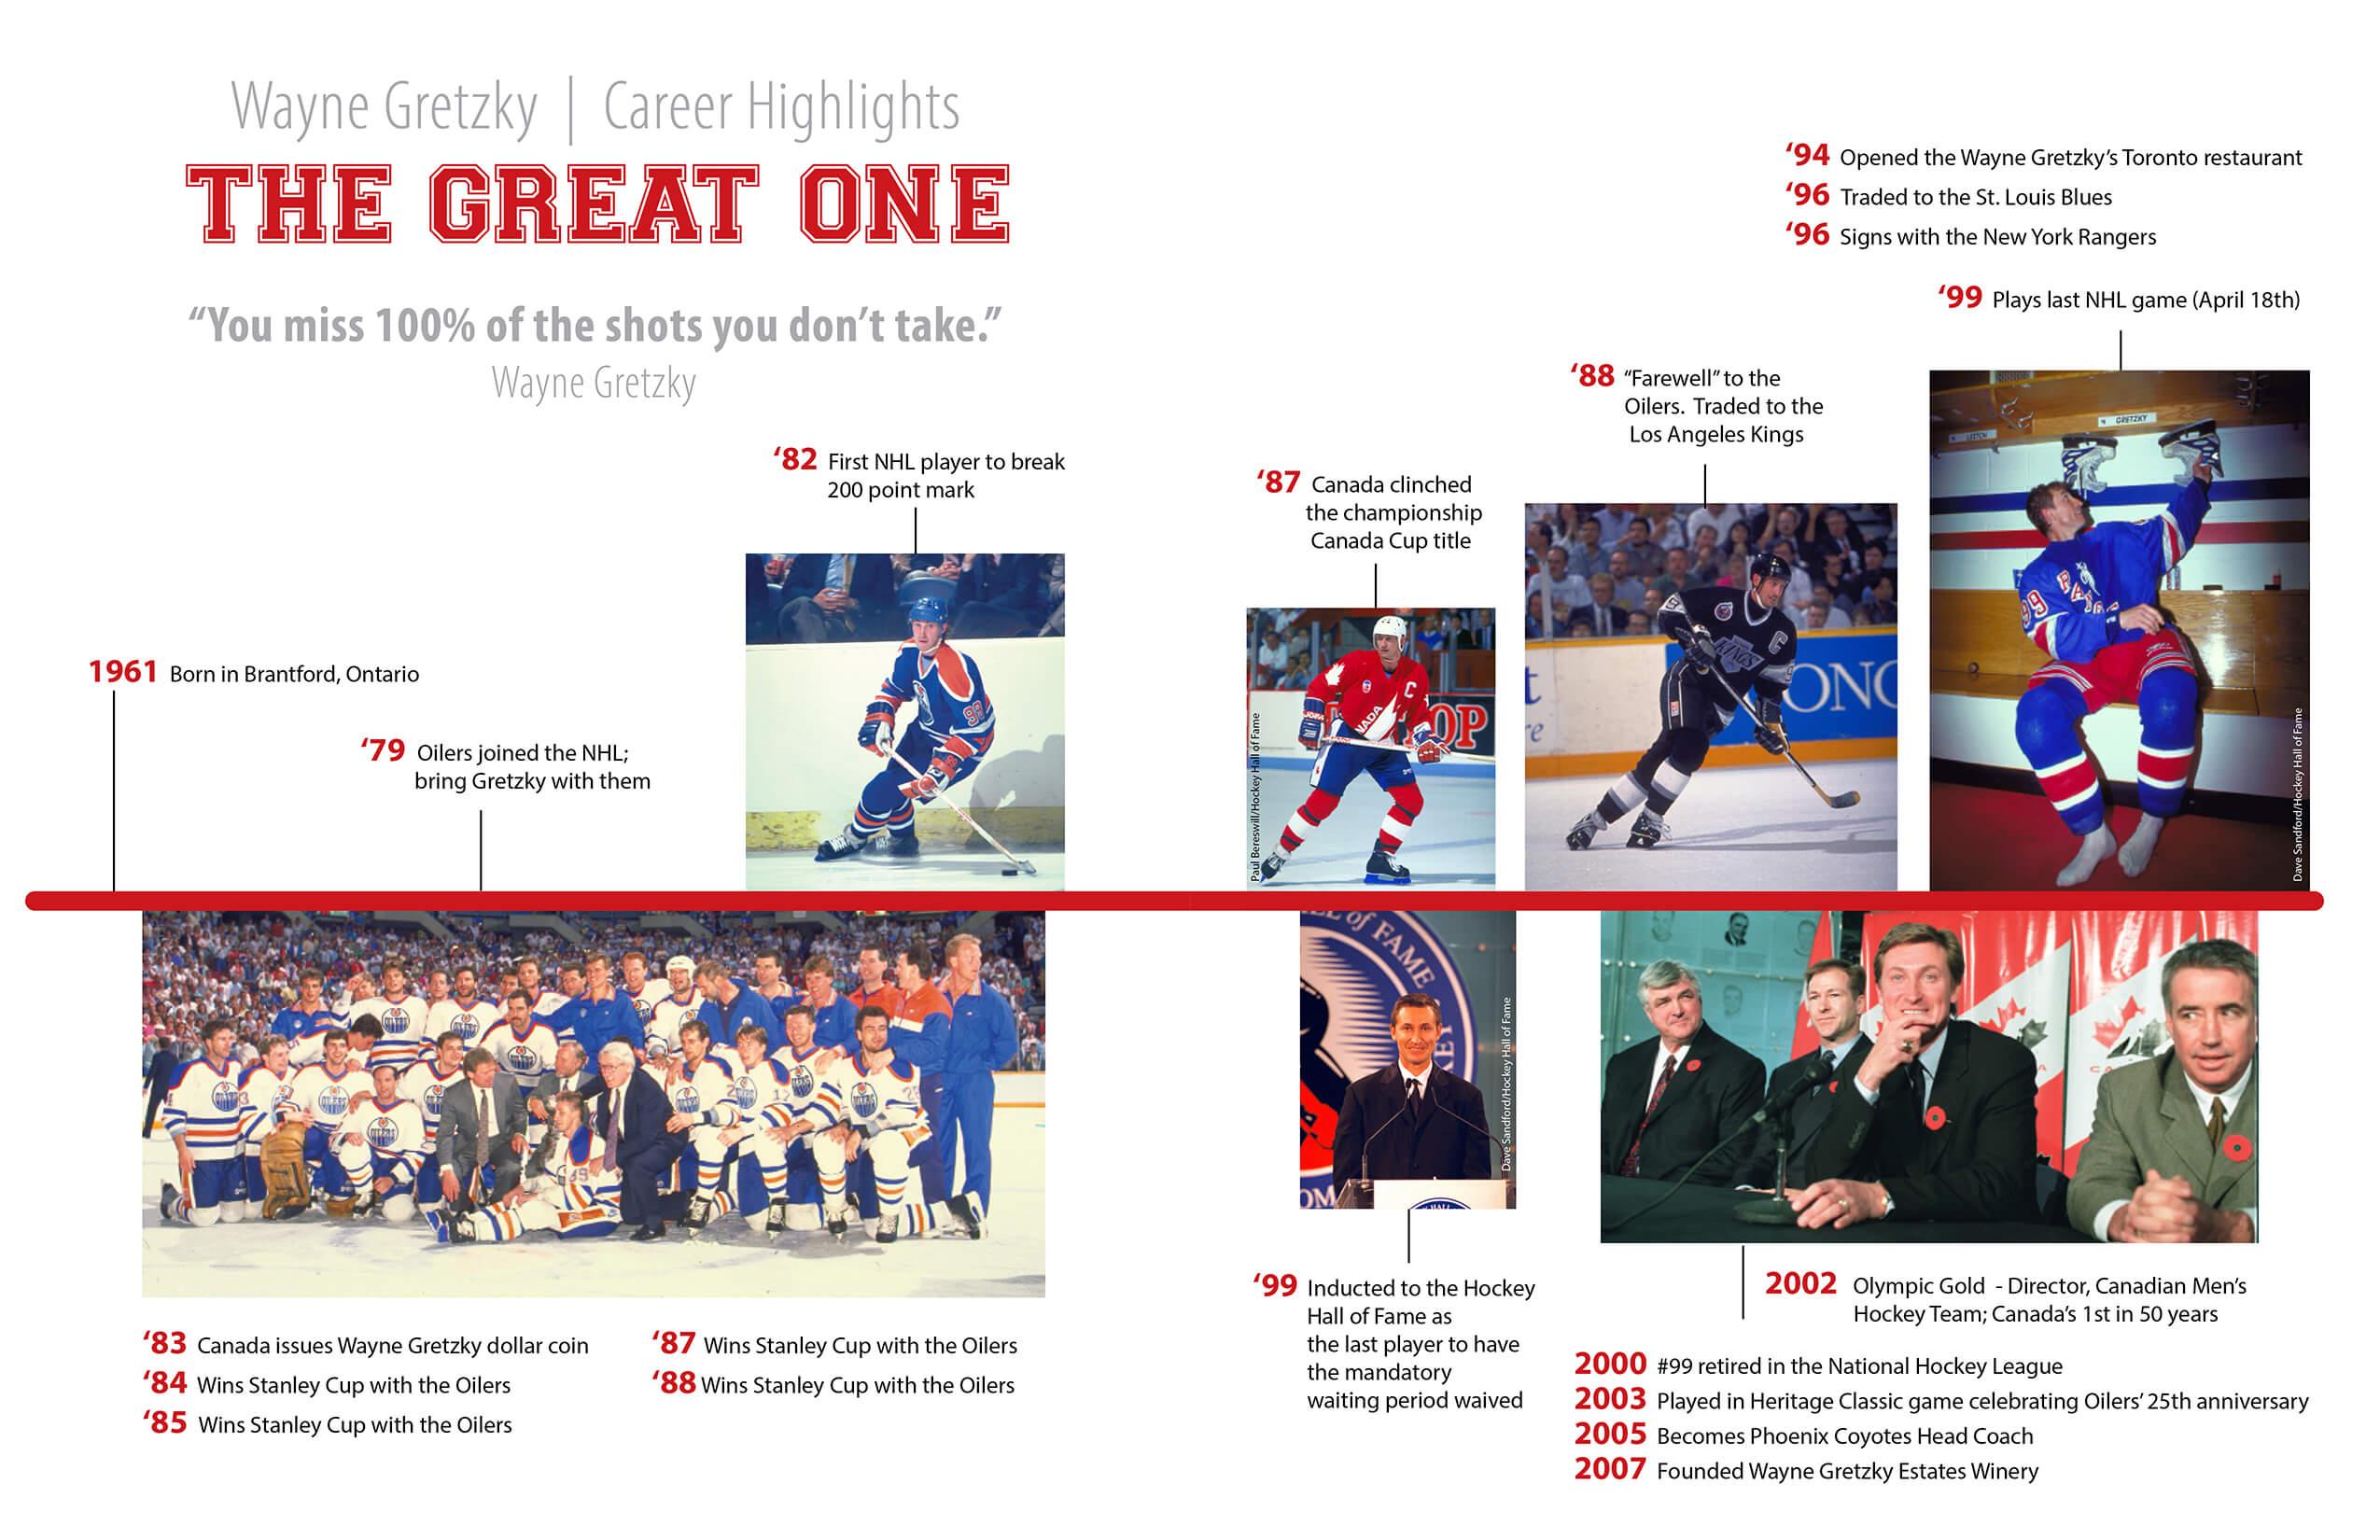 Career Highlights, Wayne Gretzky